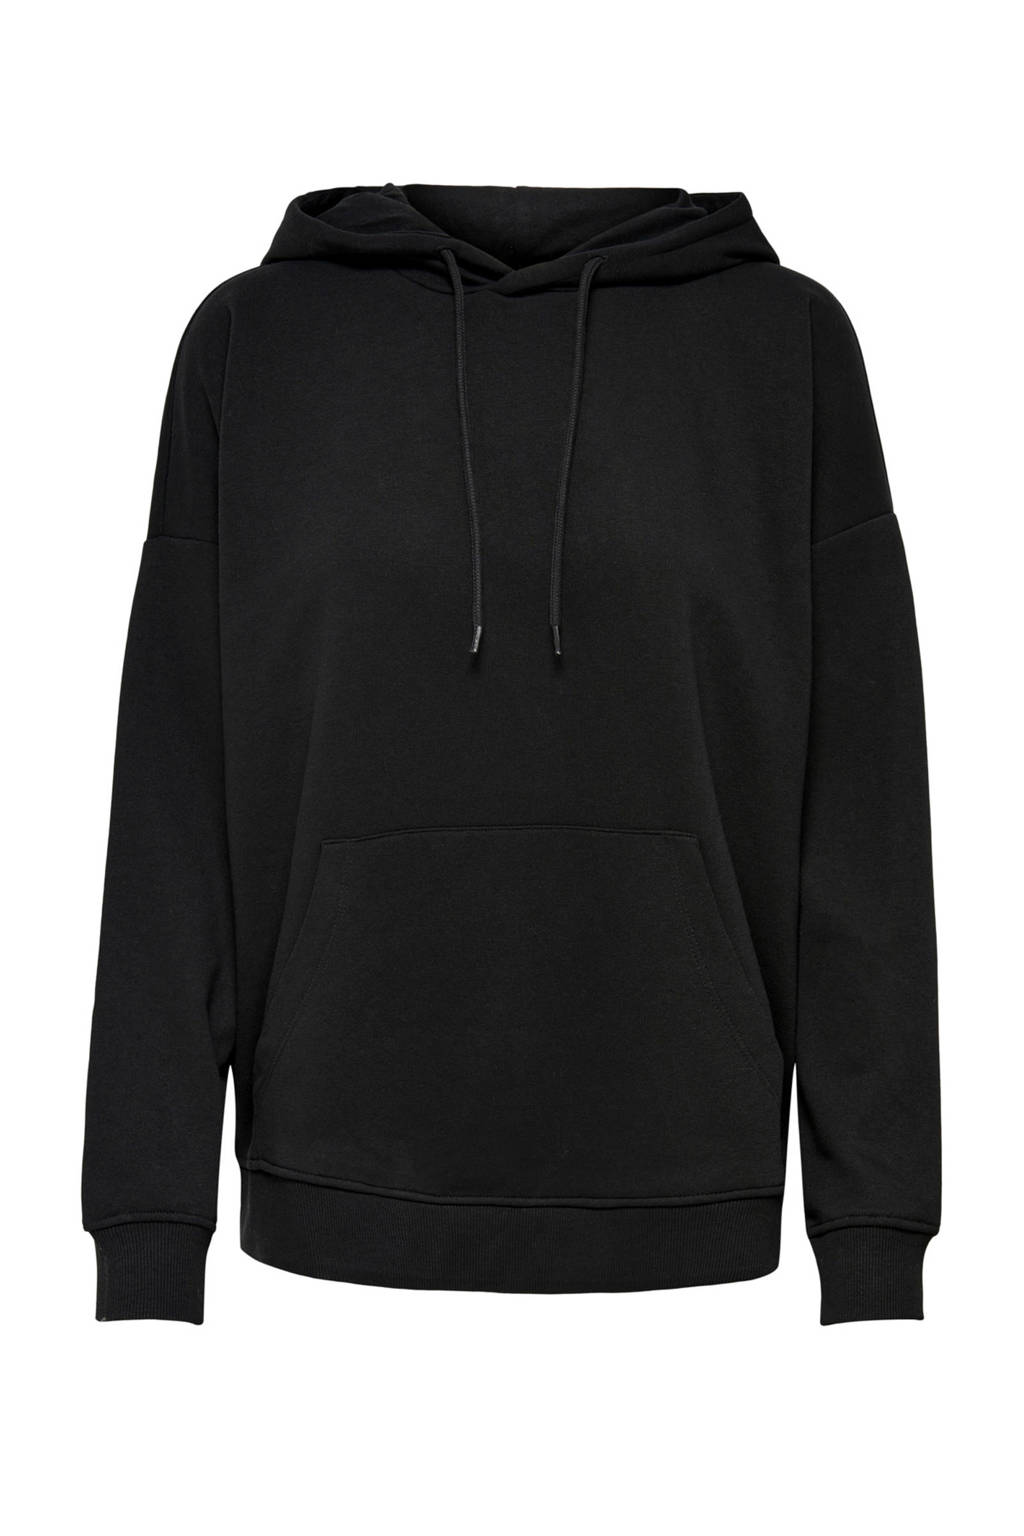 ONLY hoodie zwart, Zwart